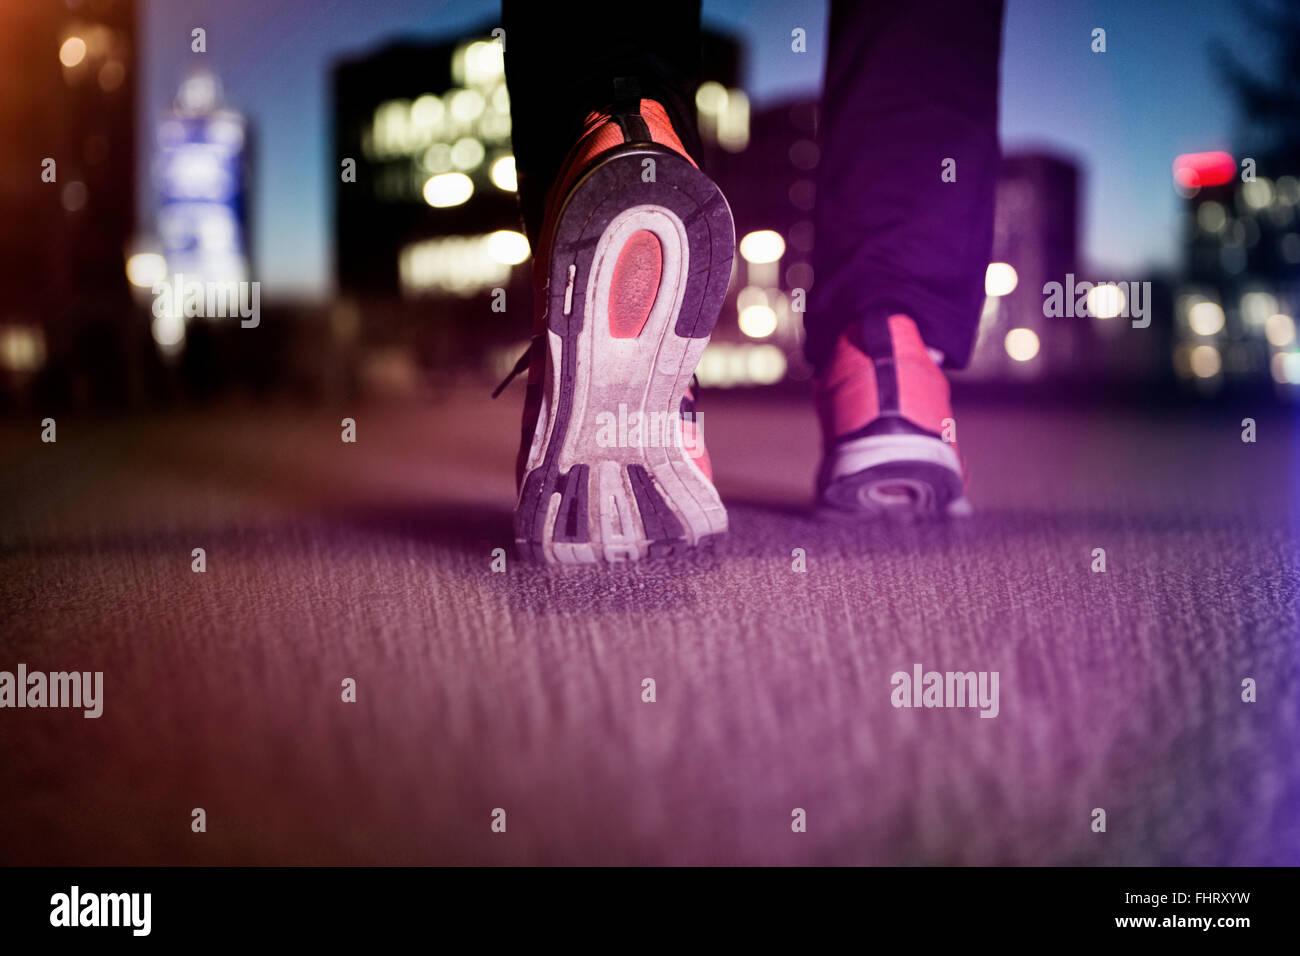 Sneakers of jogging man on tarmac at night - Stock Image